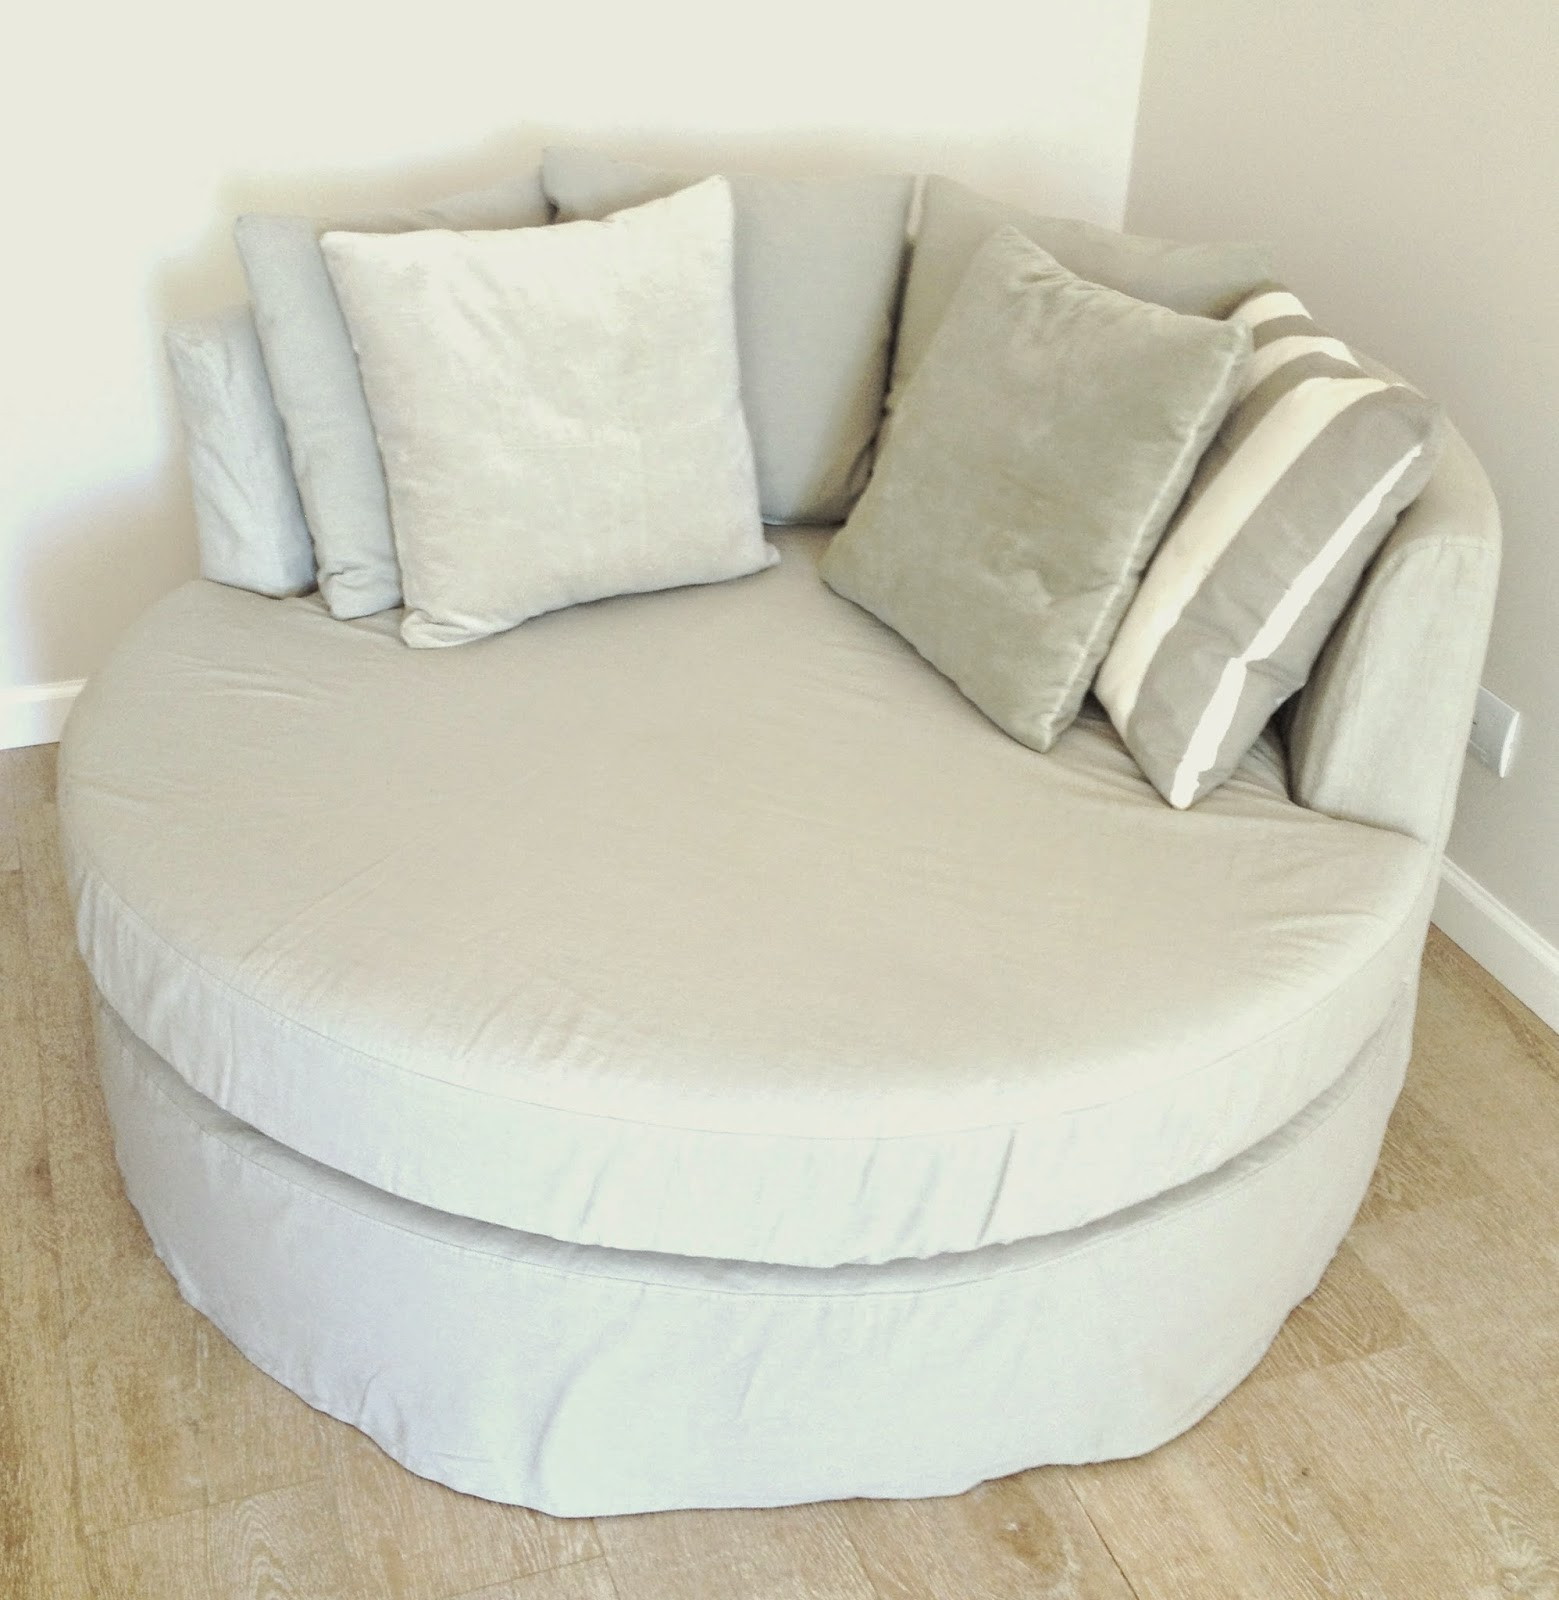 alma deco buenos aires sill n ine alma deco 2015. Black Bedroom Furniture Sets. Home Design Ideas